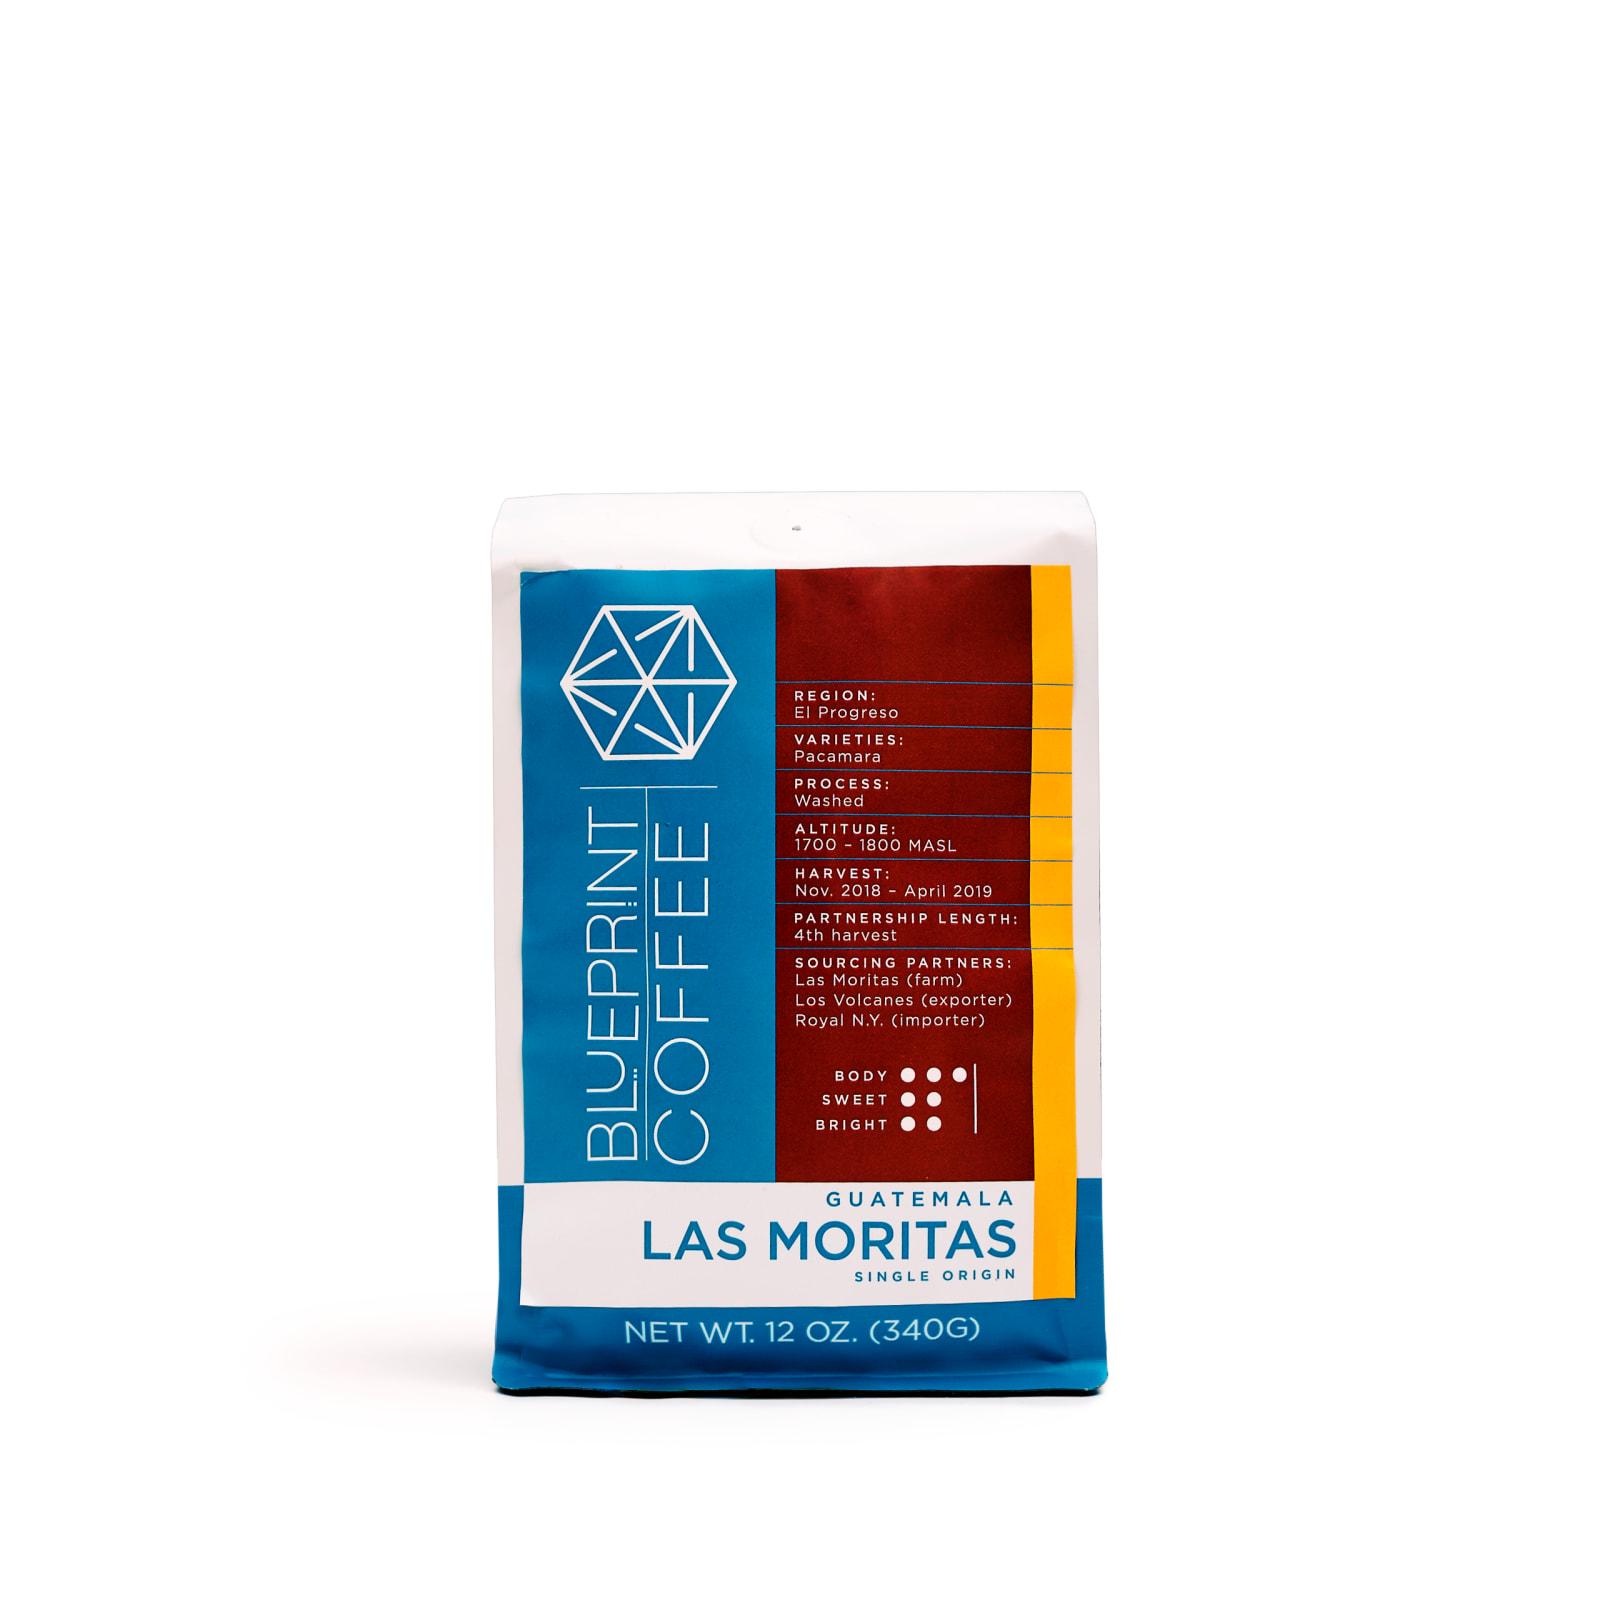 Las Moritas